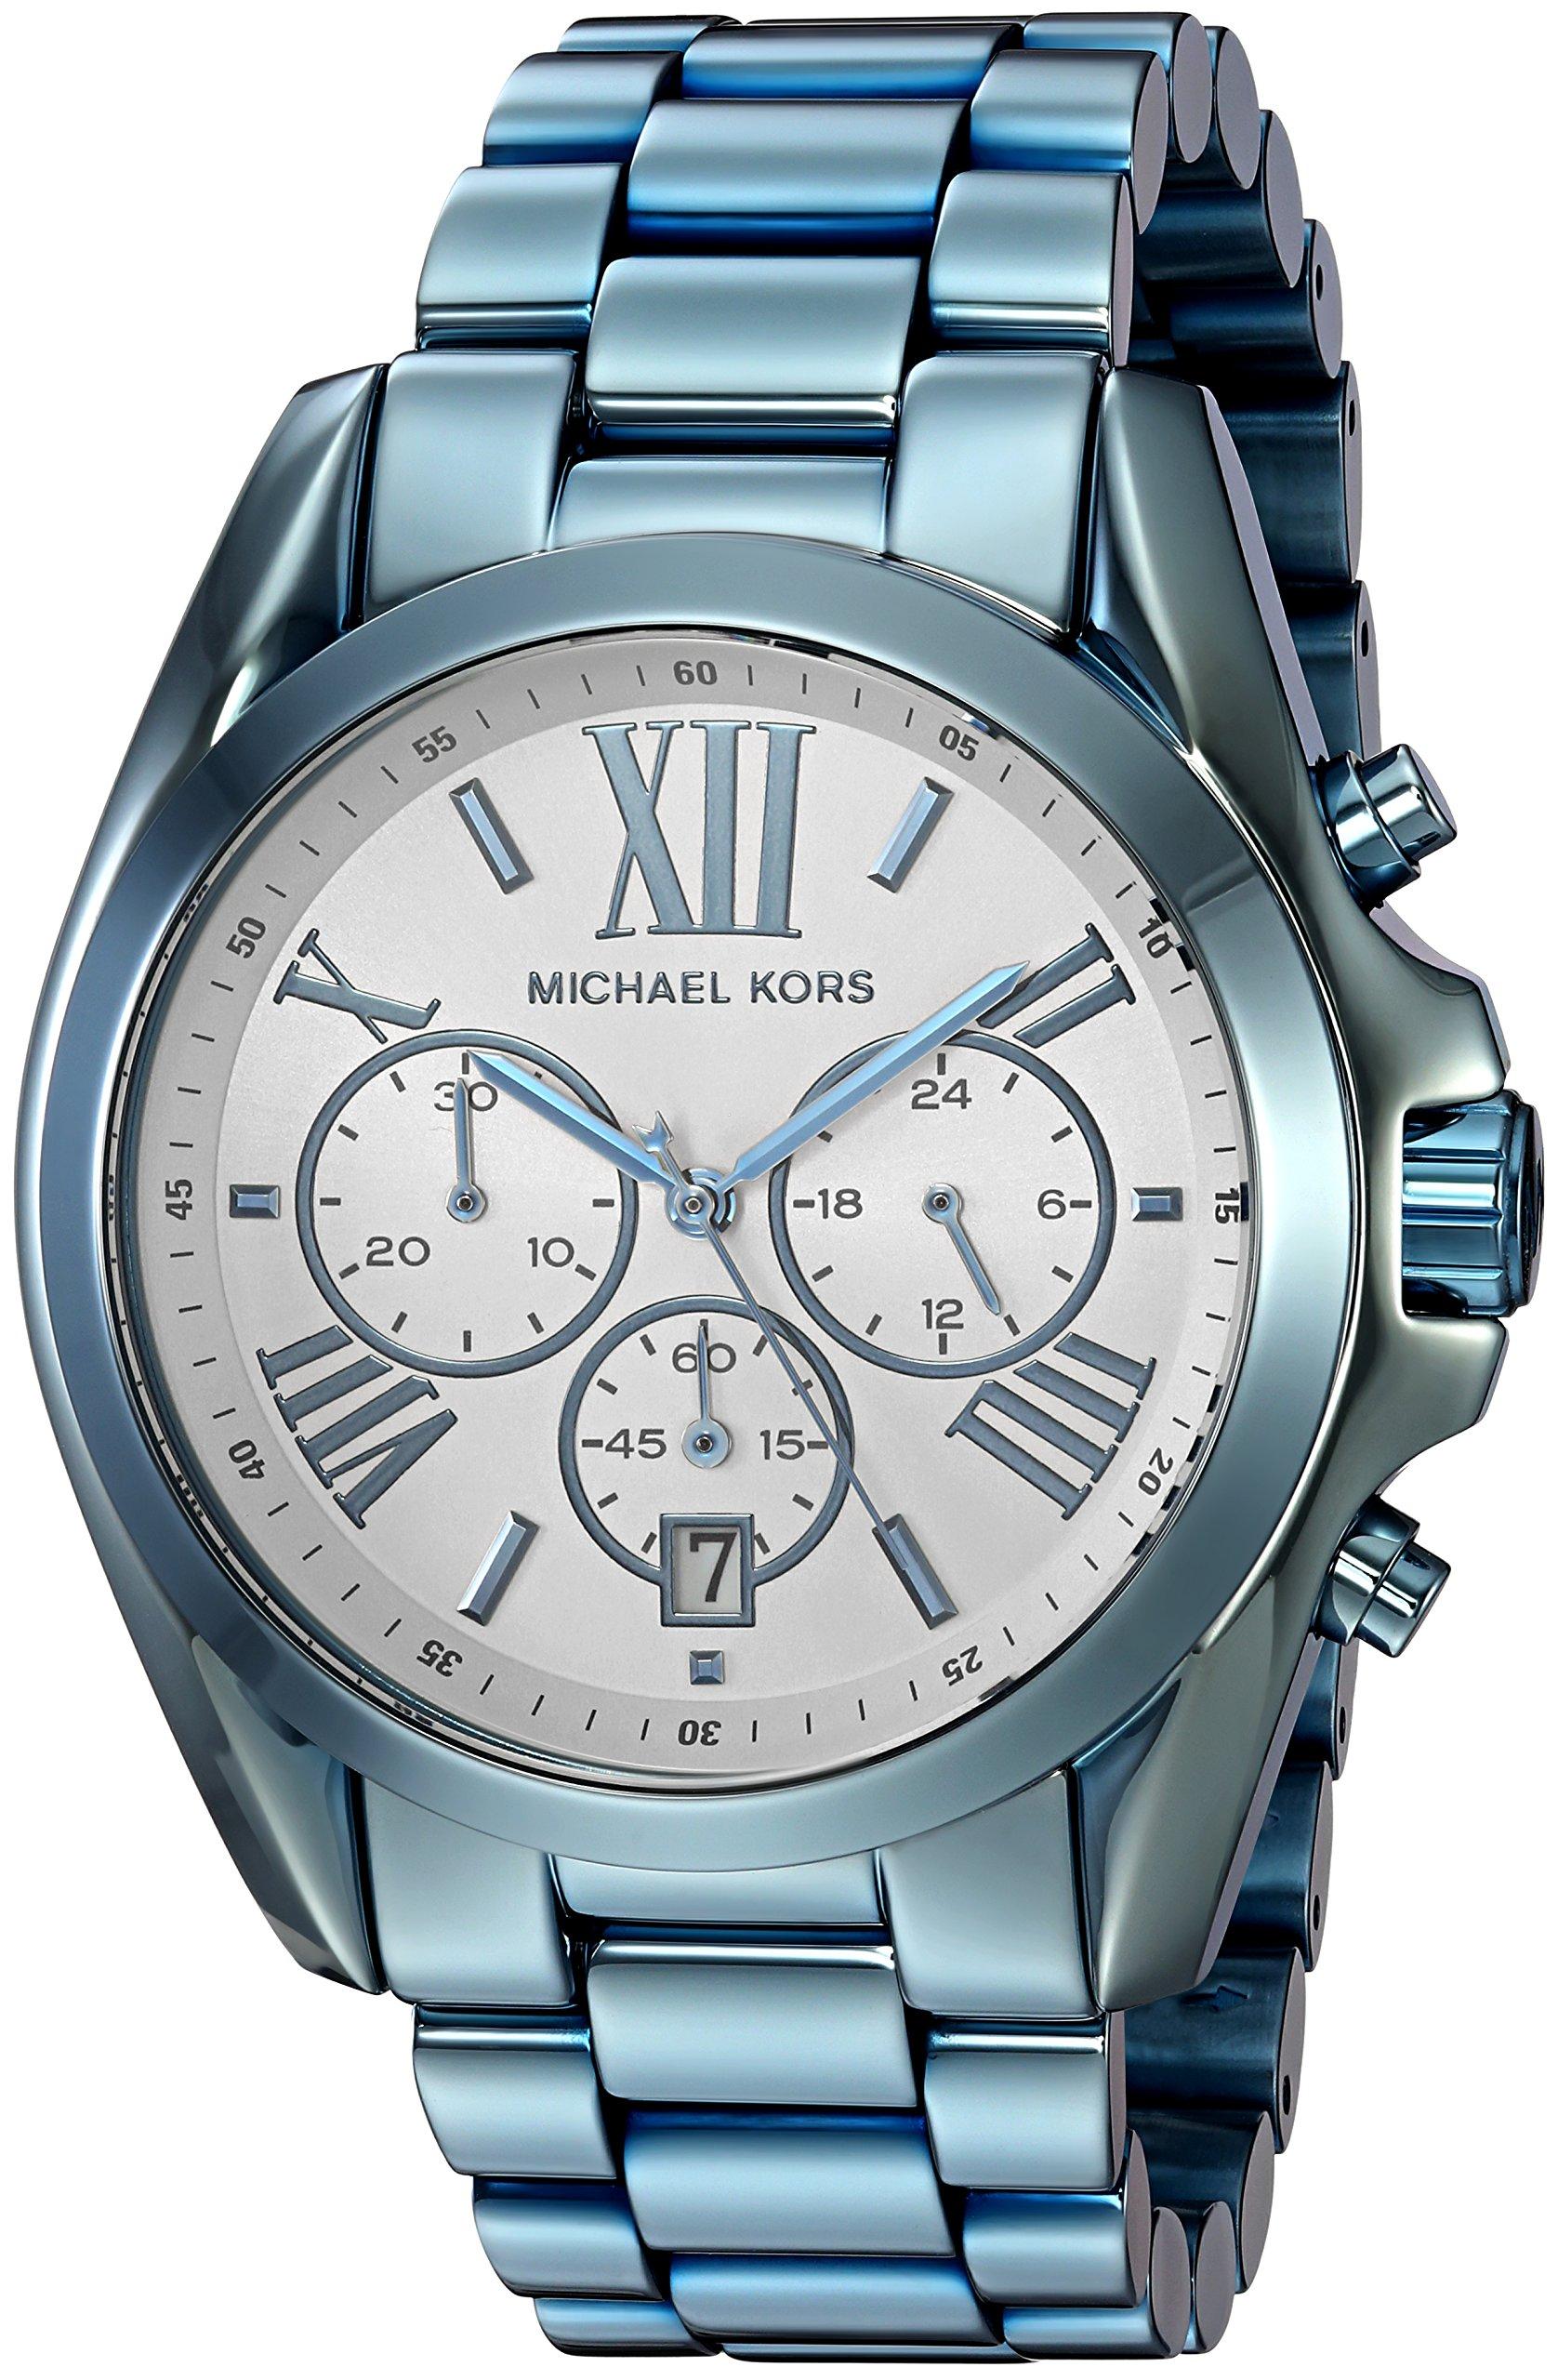 Michael Kors Women's Quartz Stainless Steel Casual Watch, Color:Blue (Model: MK6488) by Michael Kors